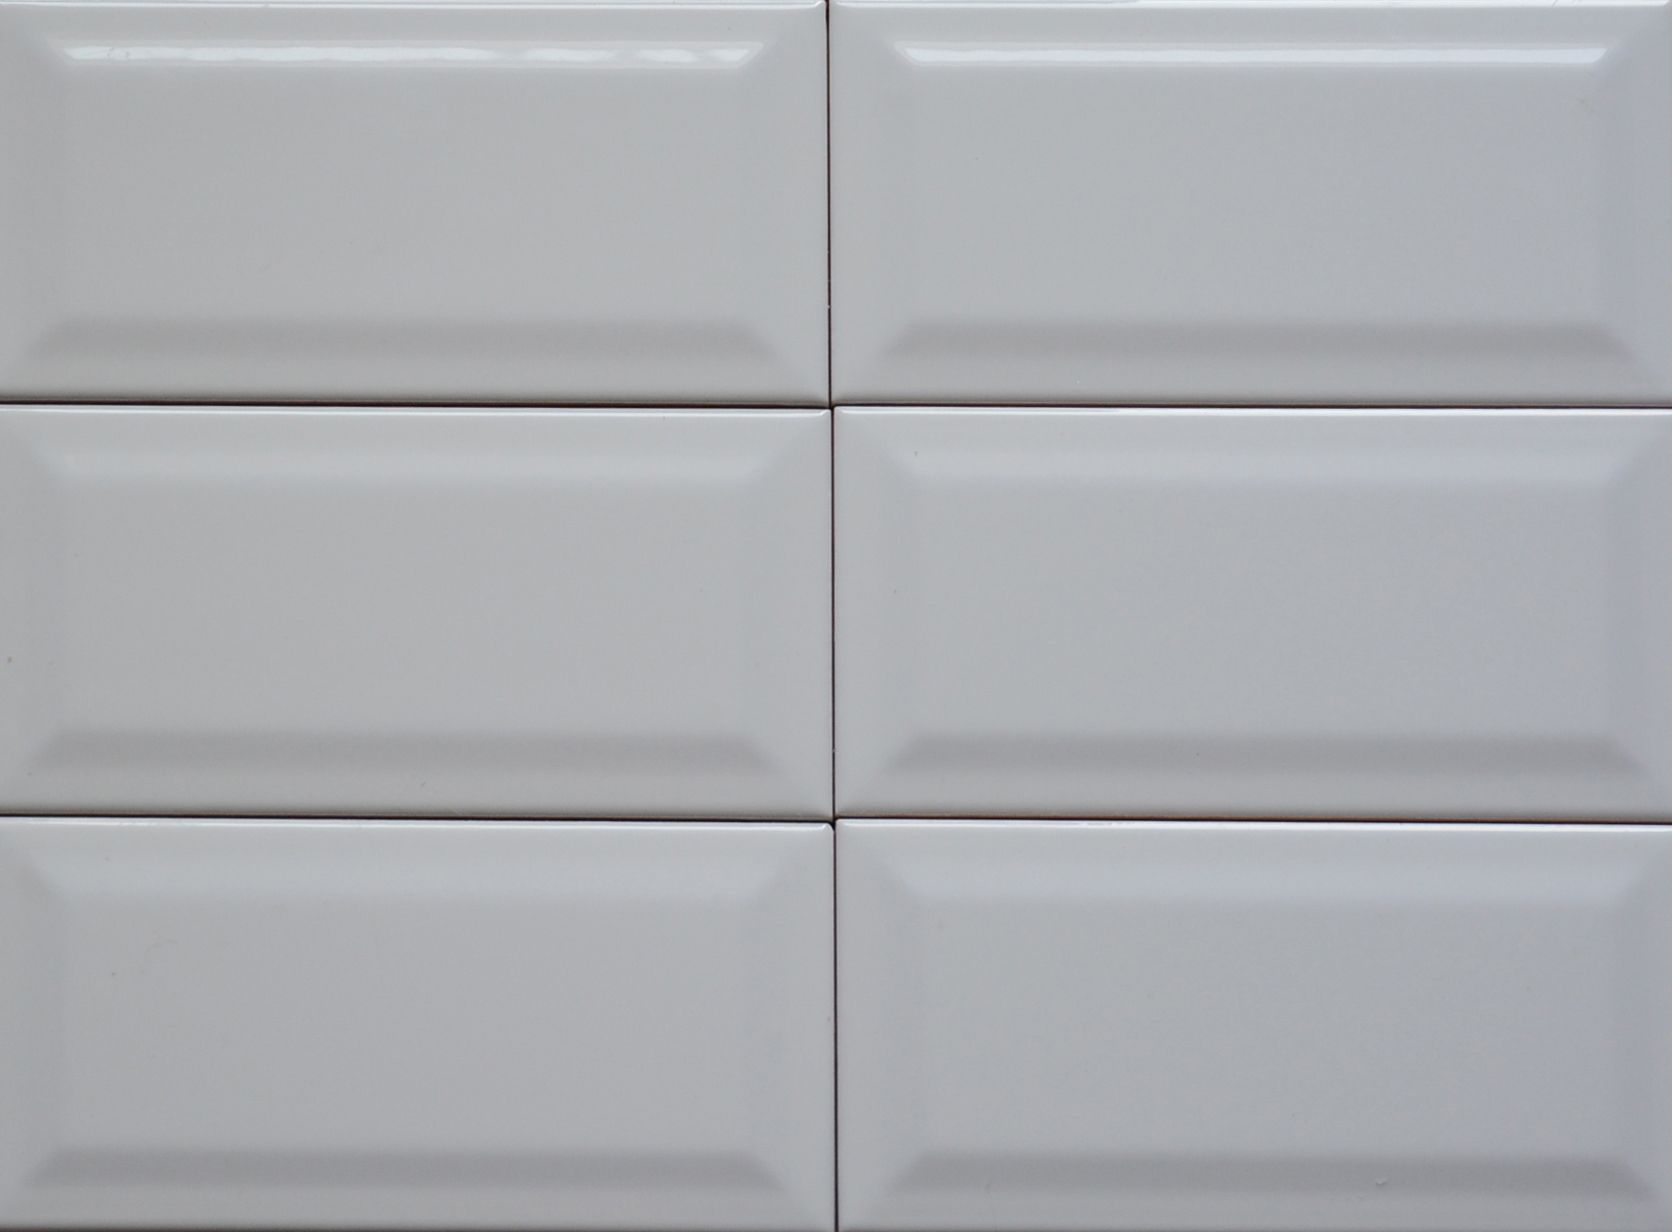 Classic Included Backsplash Tiles  - White Beveled Edge